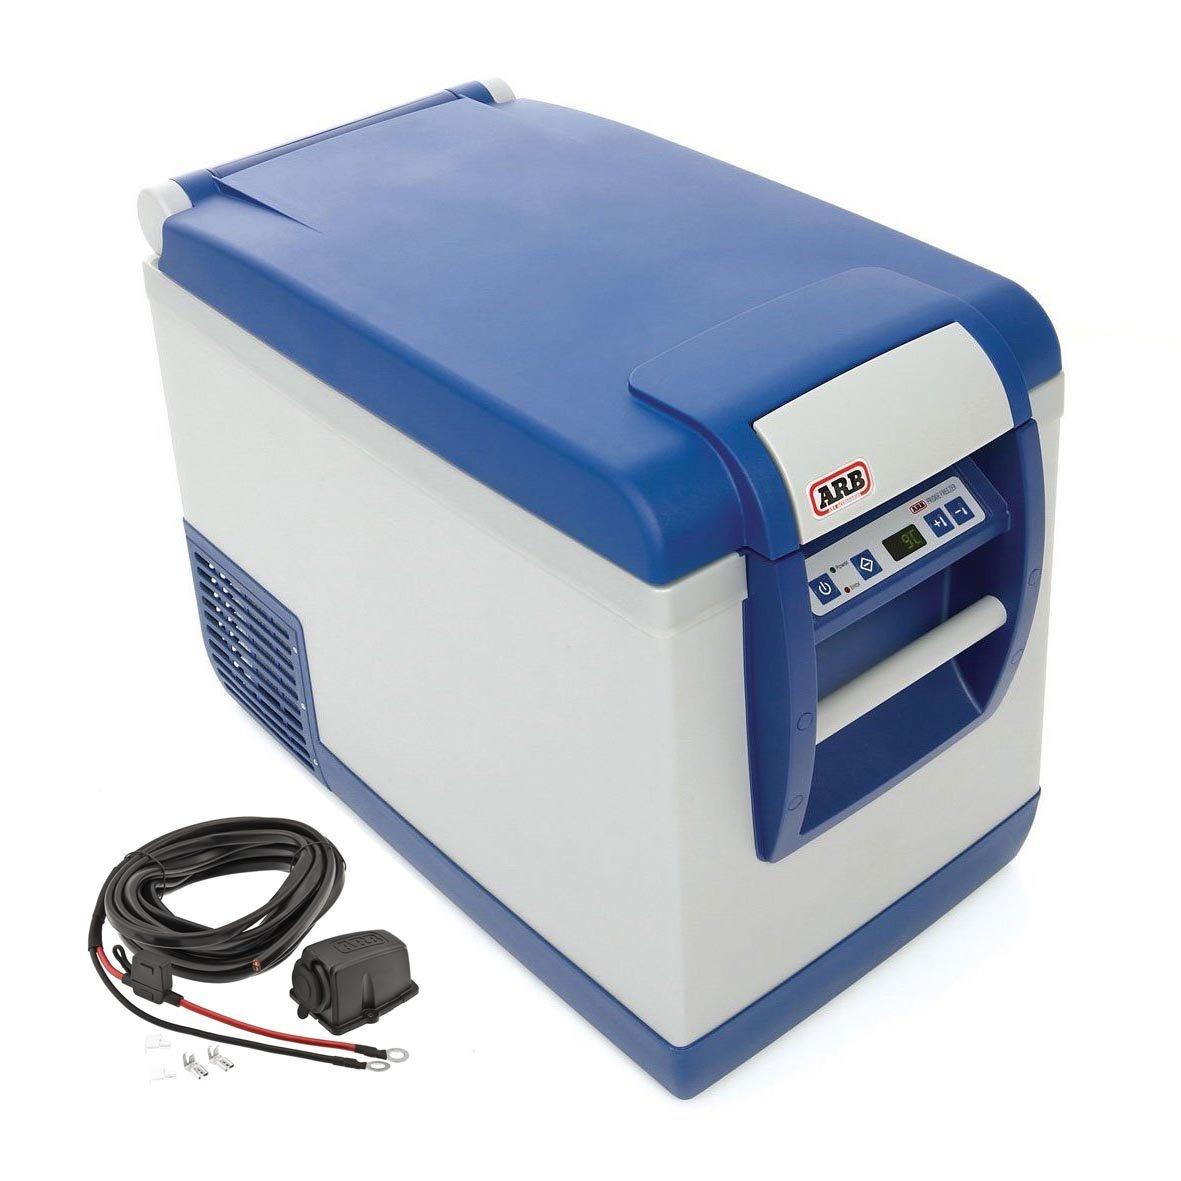 amazon com: arb 10900027 arb fridge freezer wiring kit and threaded socket  mount: automotive